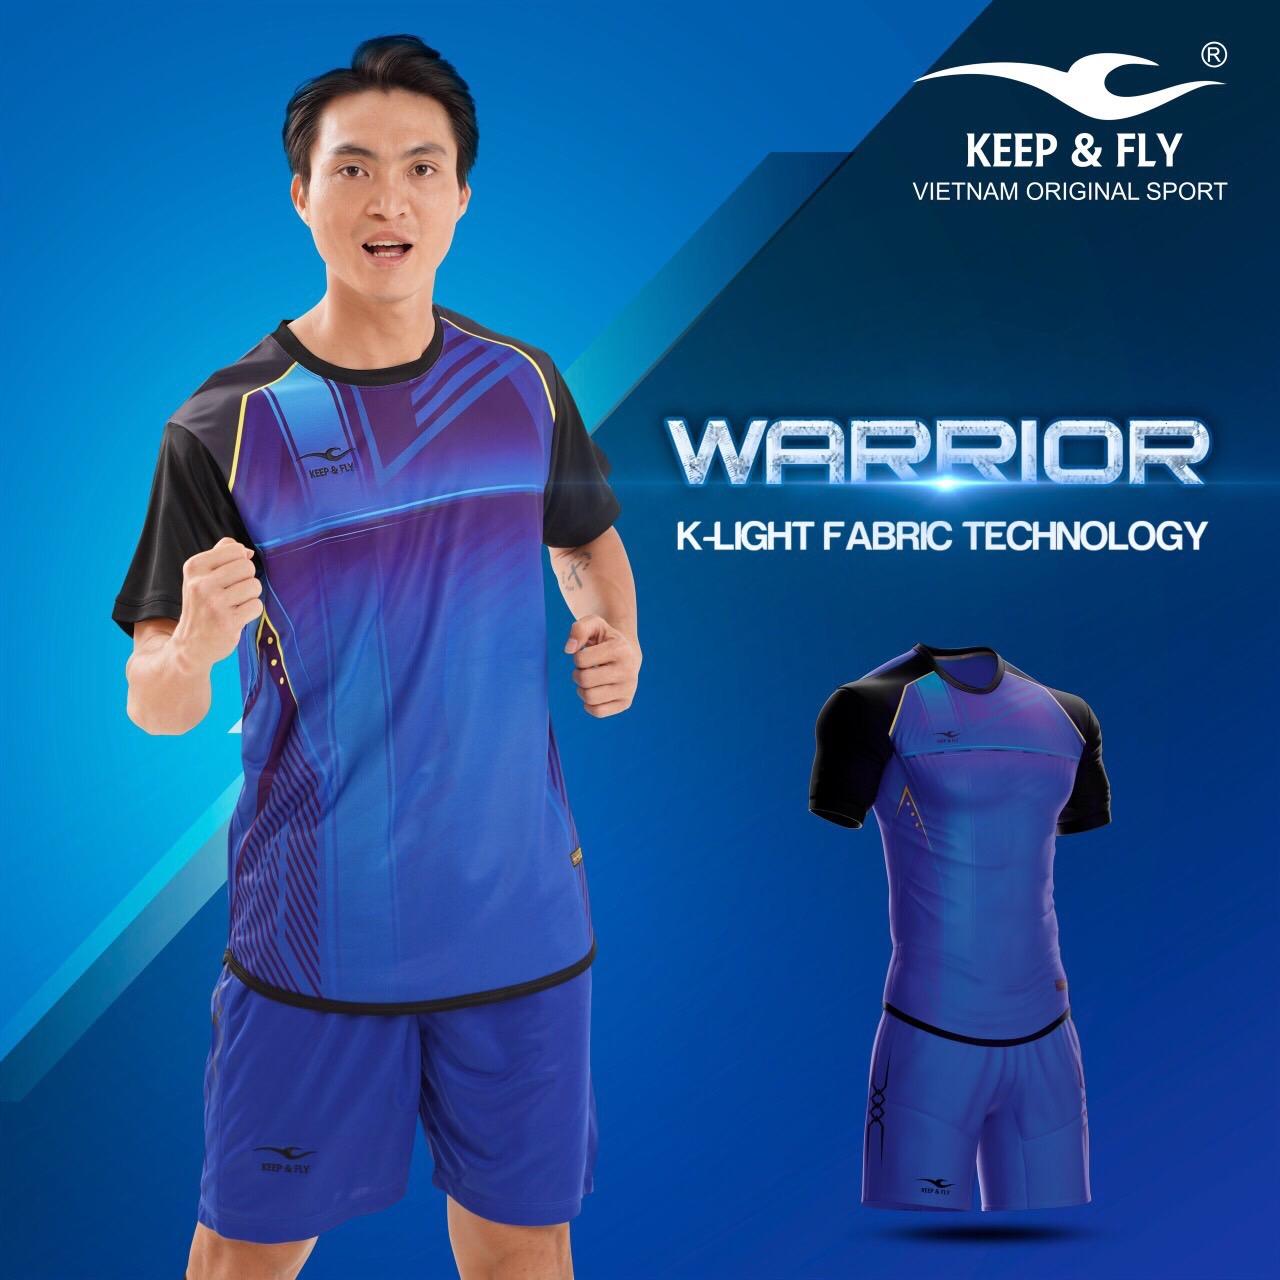 Áo bóng đá Keep & Fly Warriort